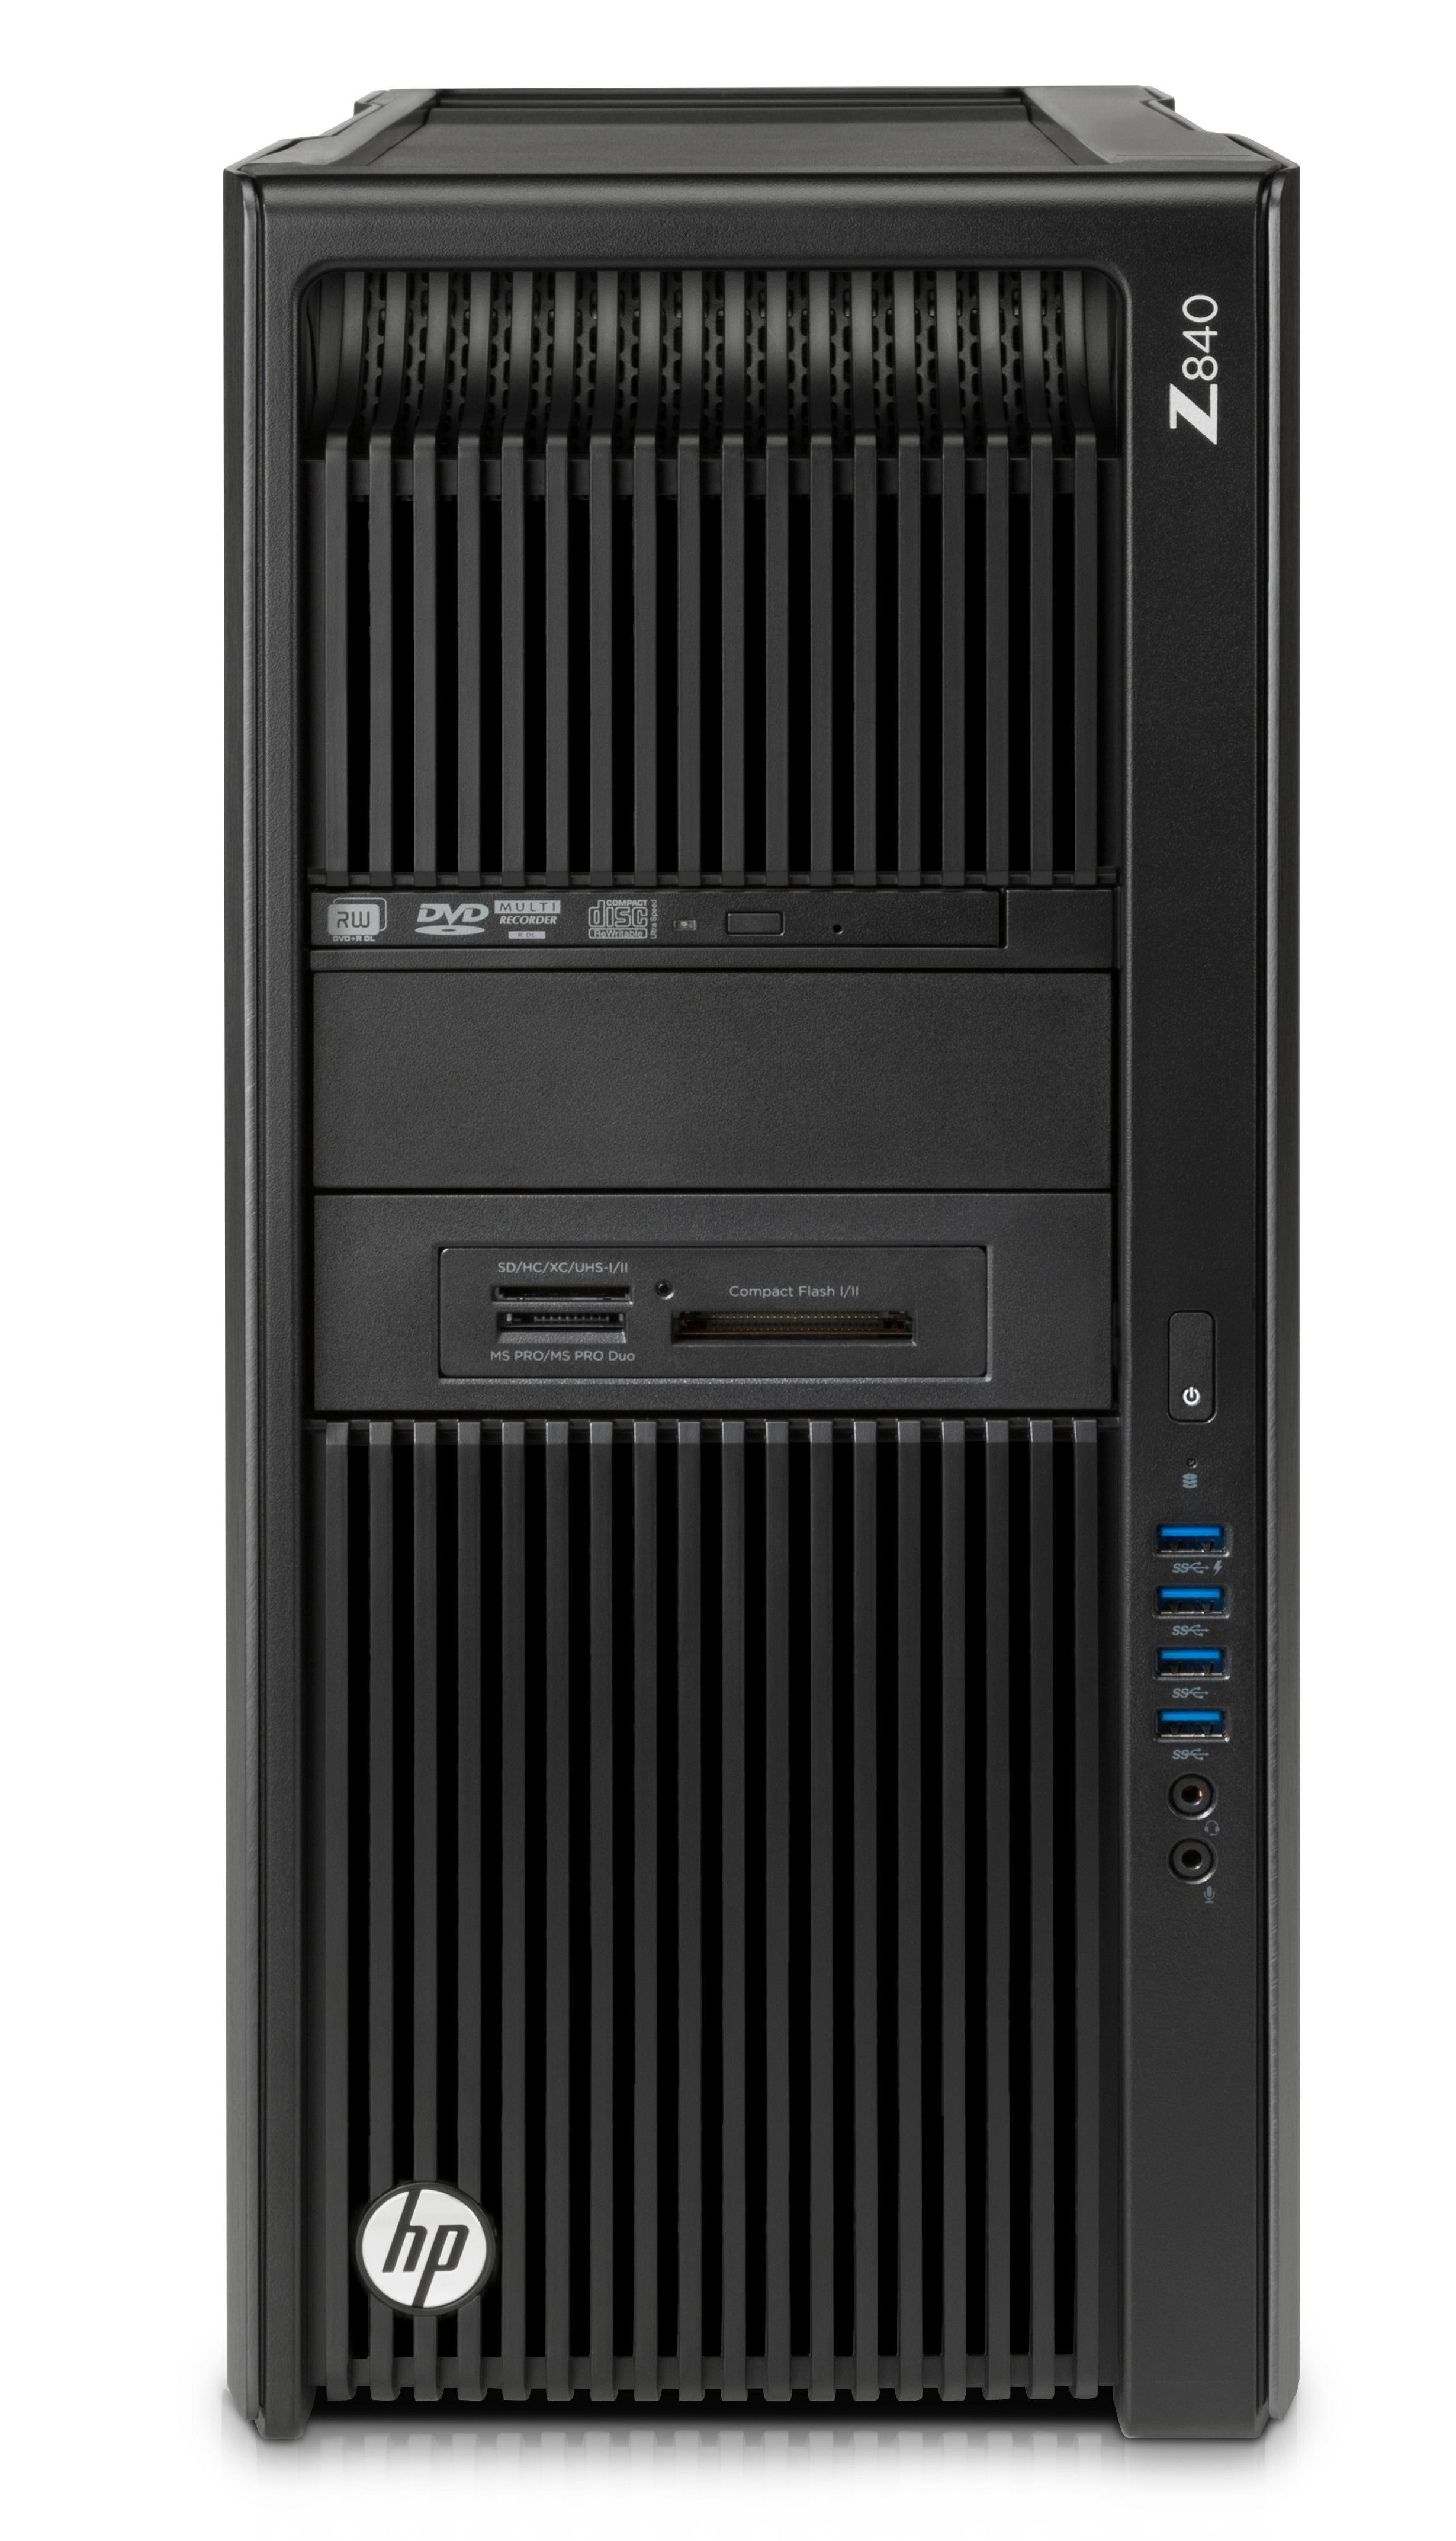 HP Z840 Intel® Xeon® E5 v4 E5-2620V4 16 GB DDR4-SDRAM 1000 GB HDD Black  Tower Workstation